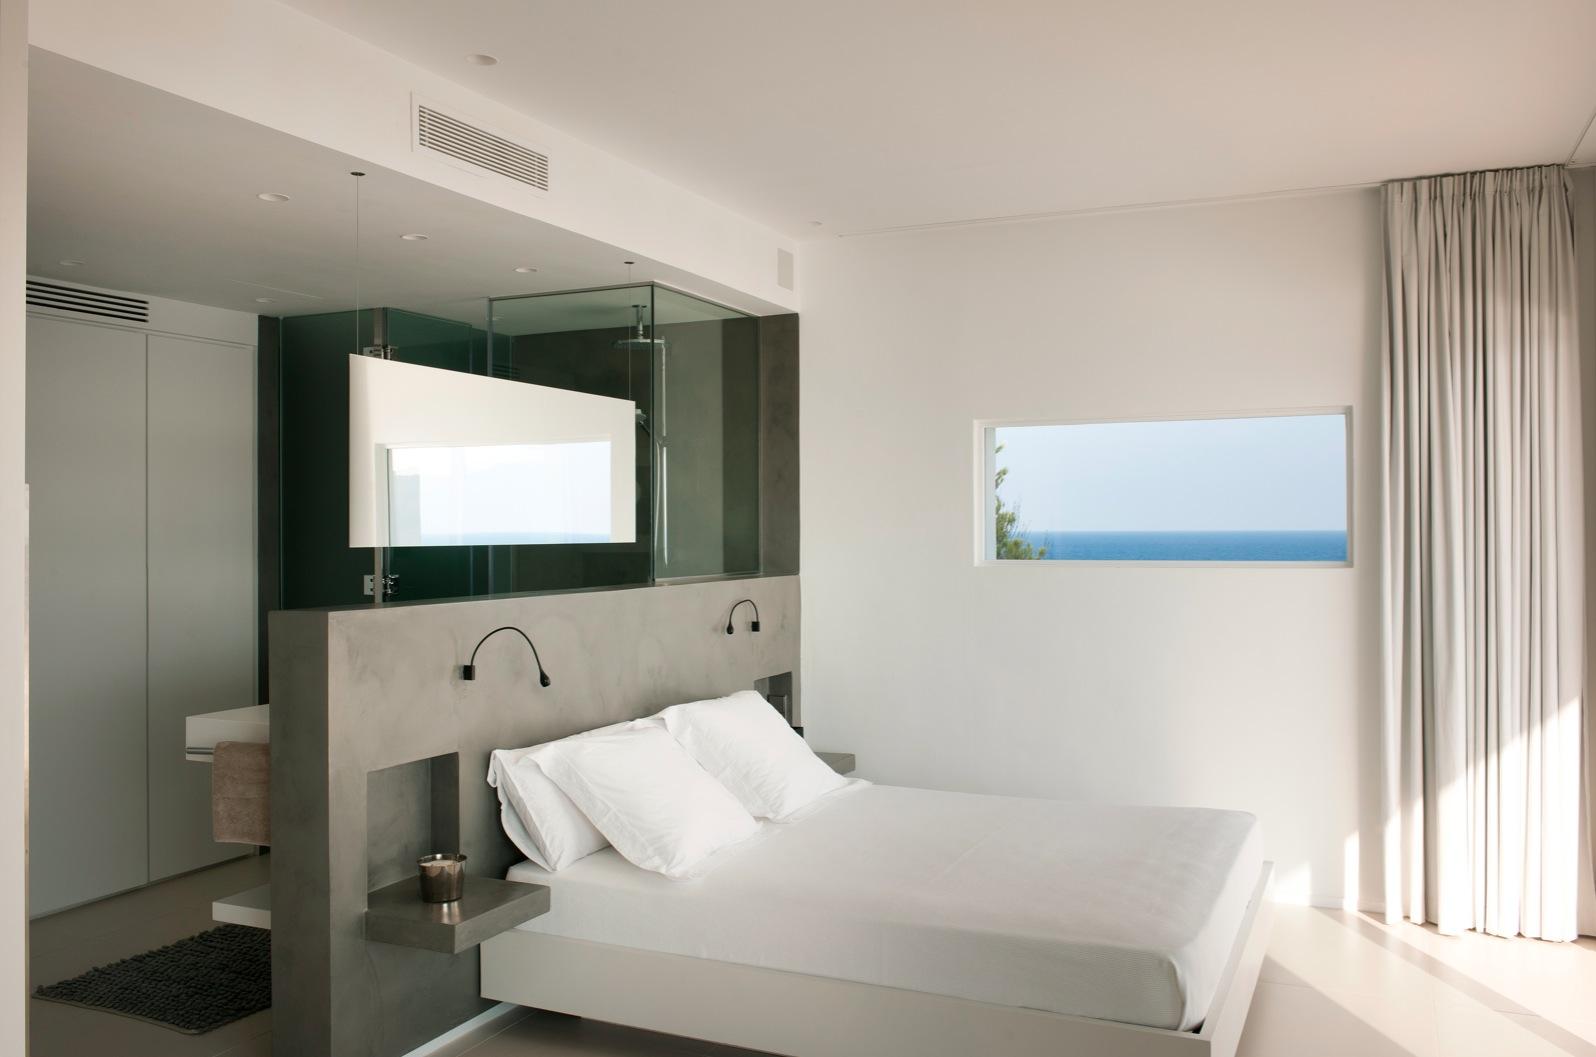 1000+ ideas about Open Plan Bathroom Design on Pinterest Open ... - ^